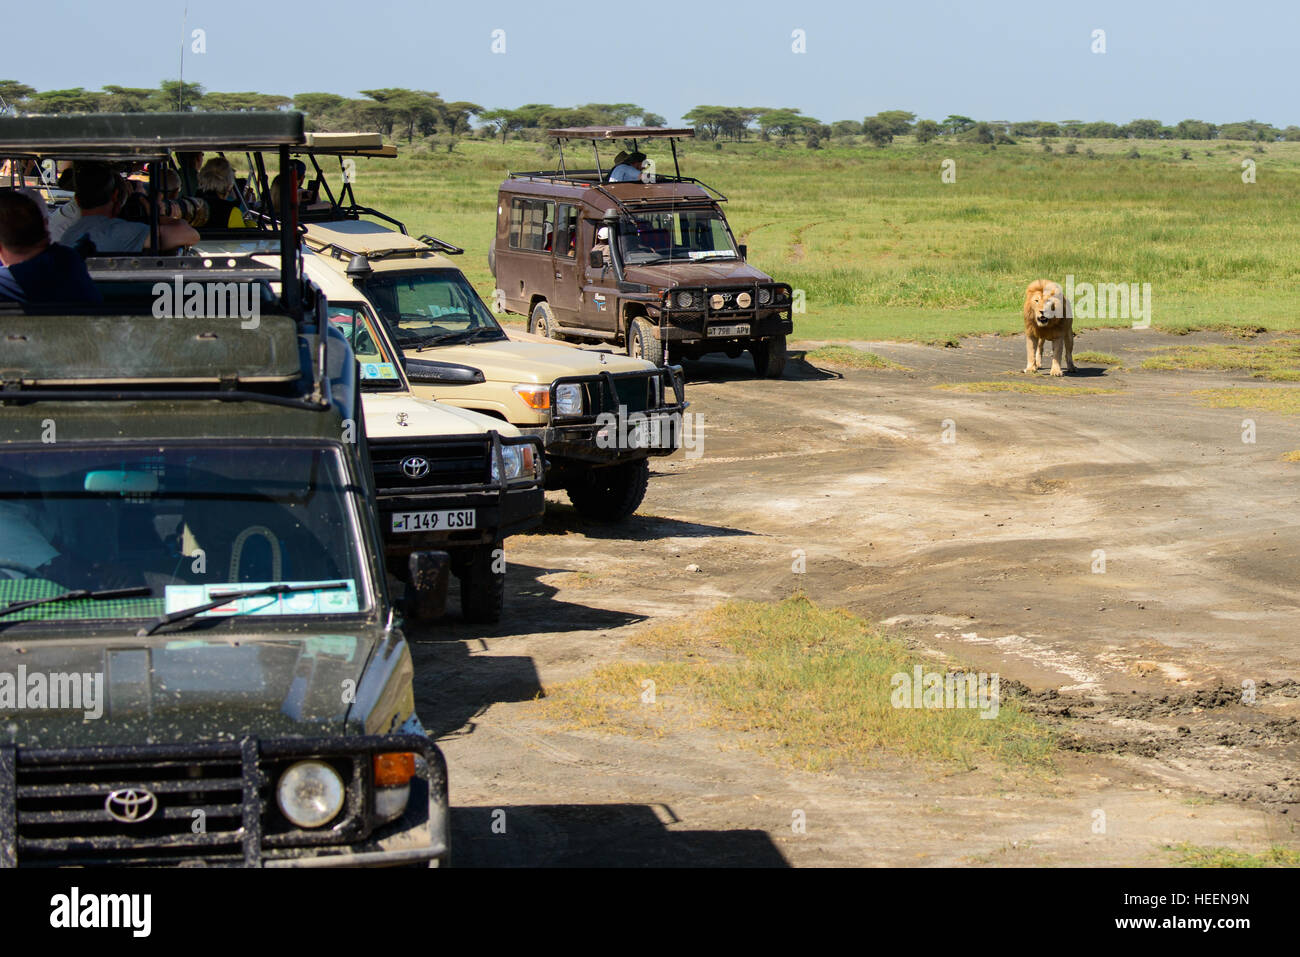 A Row Of Tourist Cars Four Wheel Drive Suv Suvs Vehicles Wait